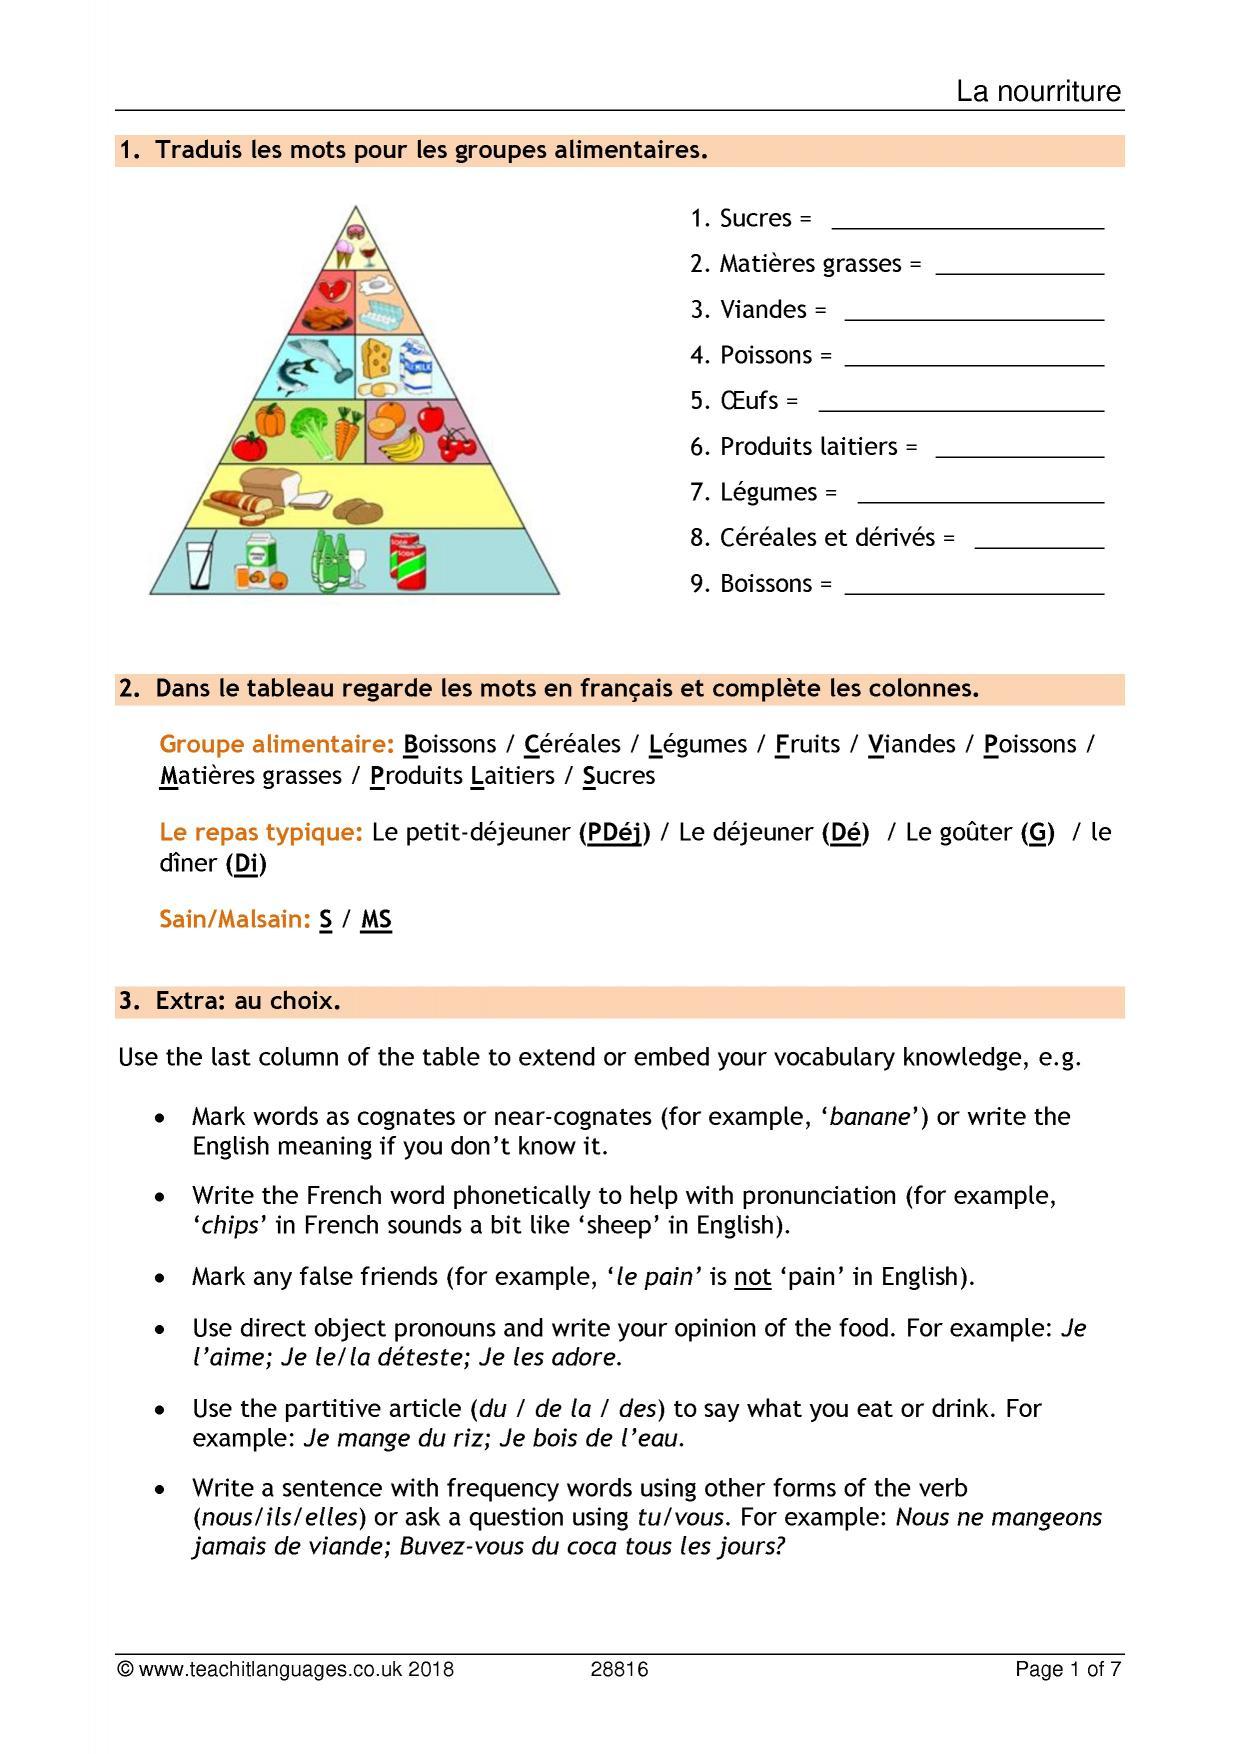 French Language Teaching Resources Teachit Languages Teachit